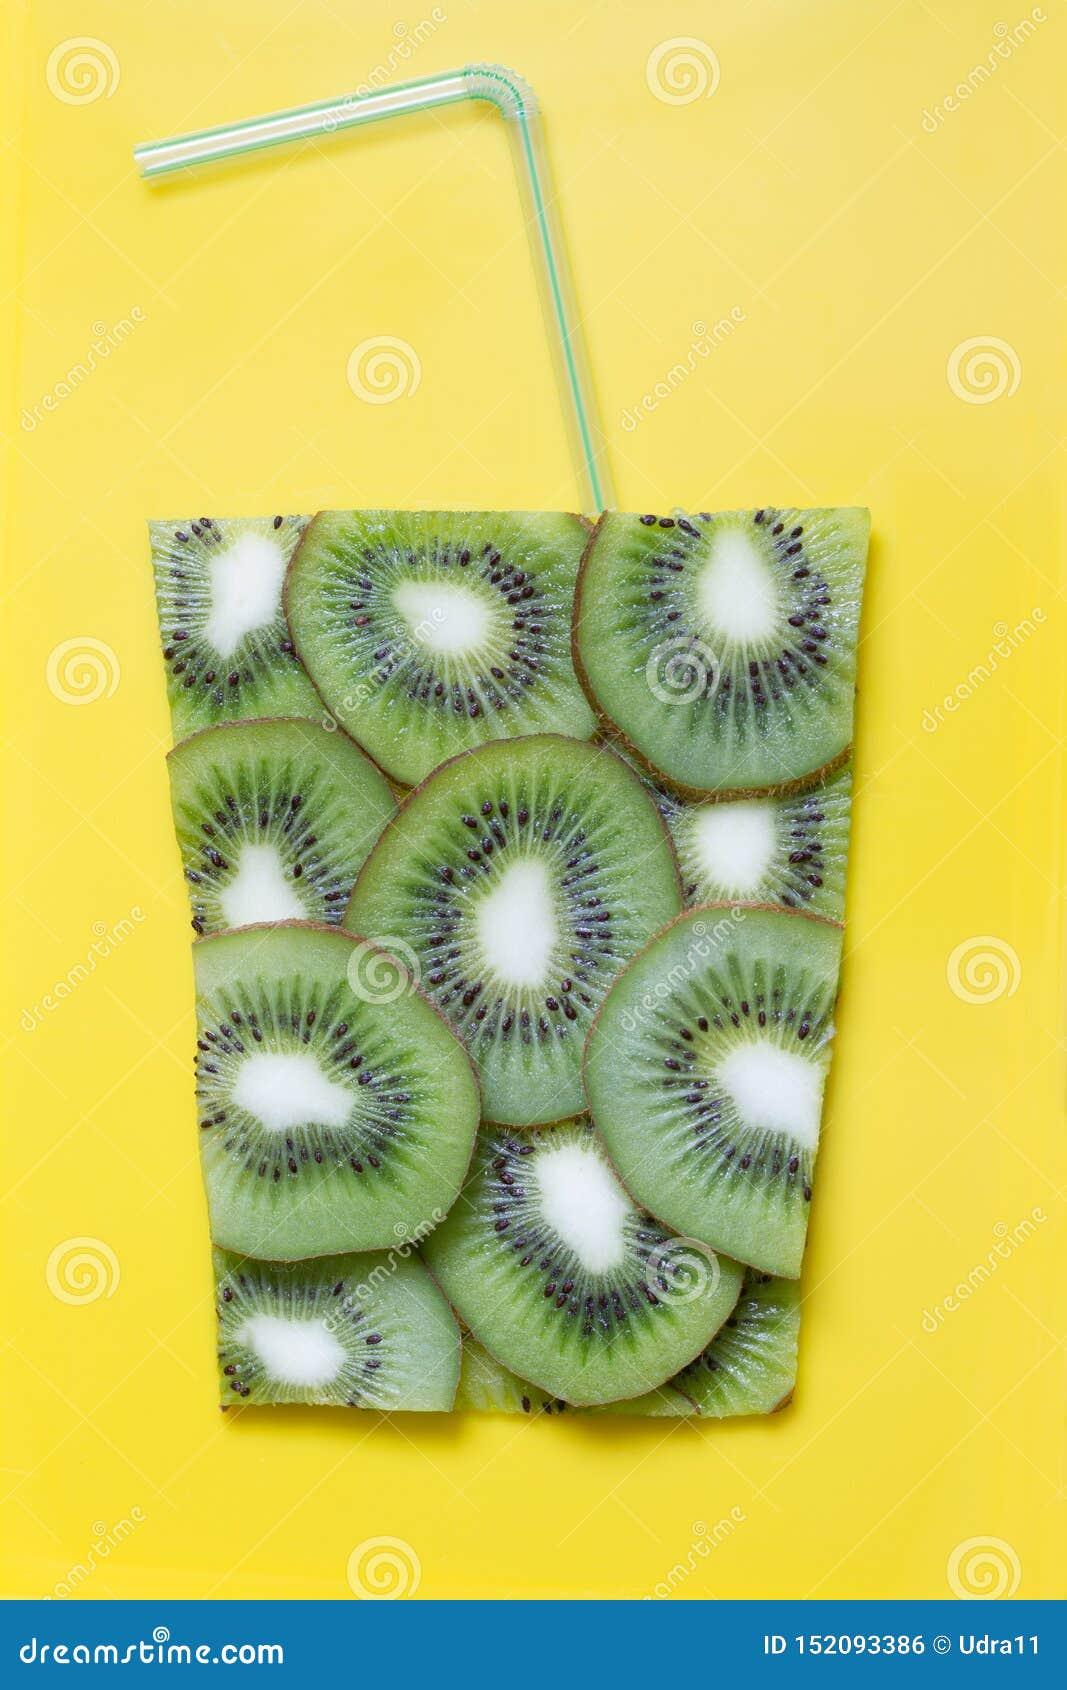 Kiwi juice abstract art food concept